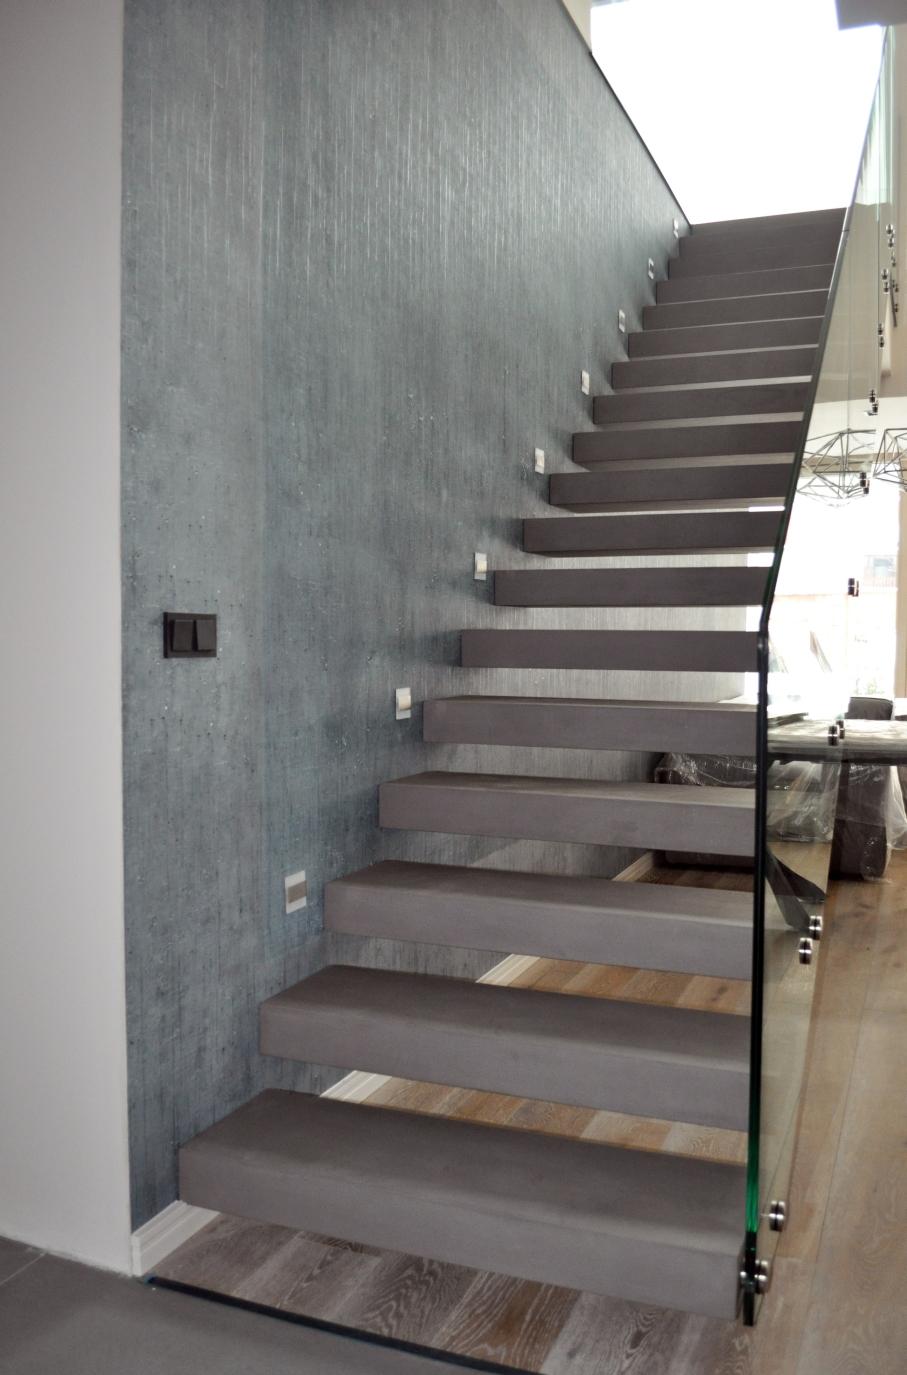 harmony beton konyhapult s beton munkalap referenci k. Black Bedroom Furniture Sets. Home Design Ideas